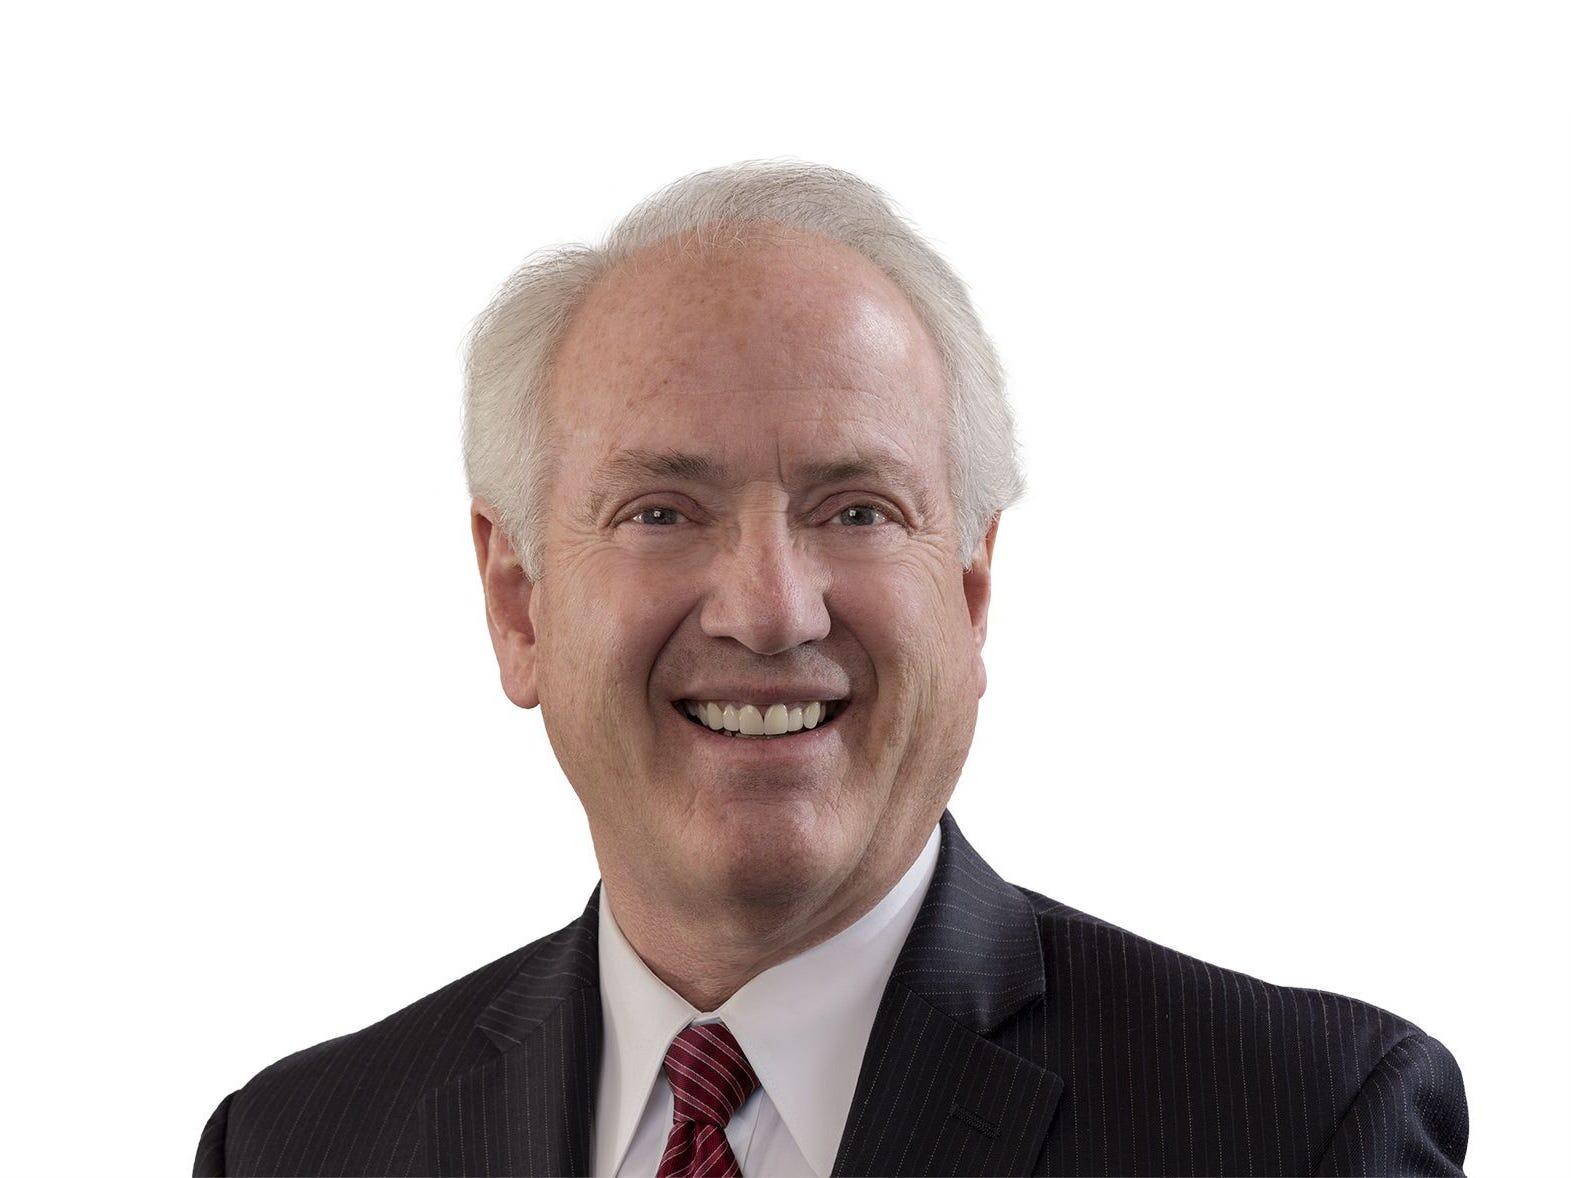 Magellan Health Inc.'s Barry Smith: Summary compensation: $7,434,946. Adjusted compensation: $3,200,838. TTM profit: $104 million. TTM revenue: $6.3 billion. 2017 stock: 28.3 percent. Capitalization: $2.4 billion.